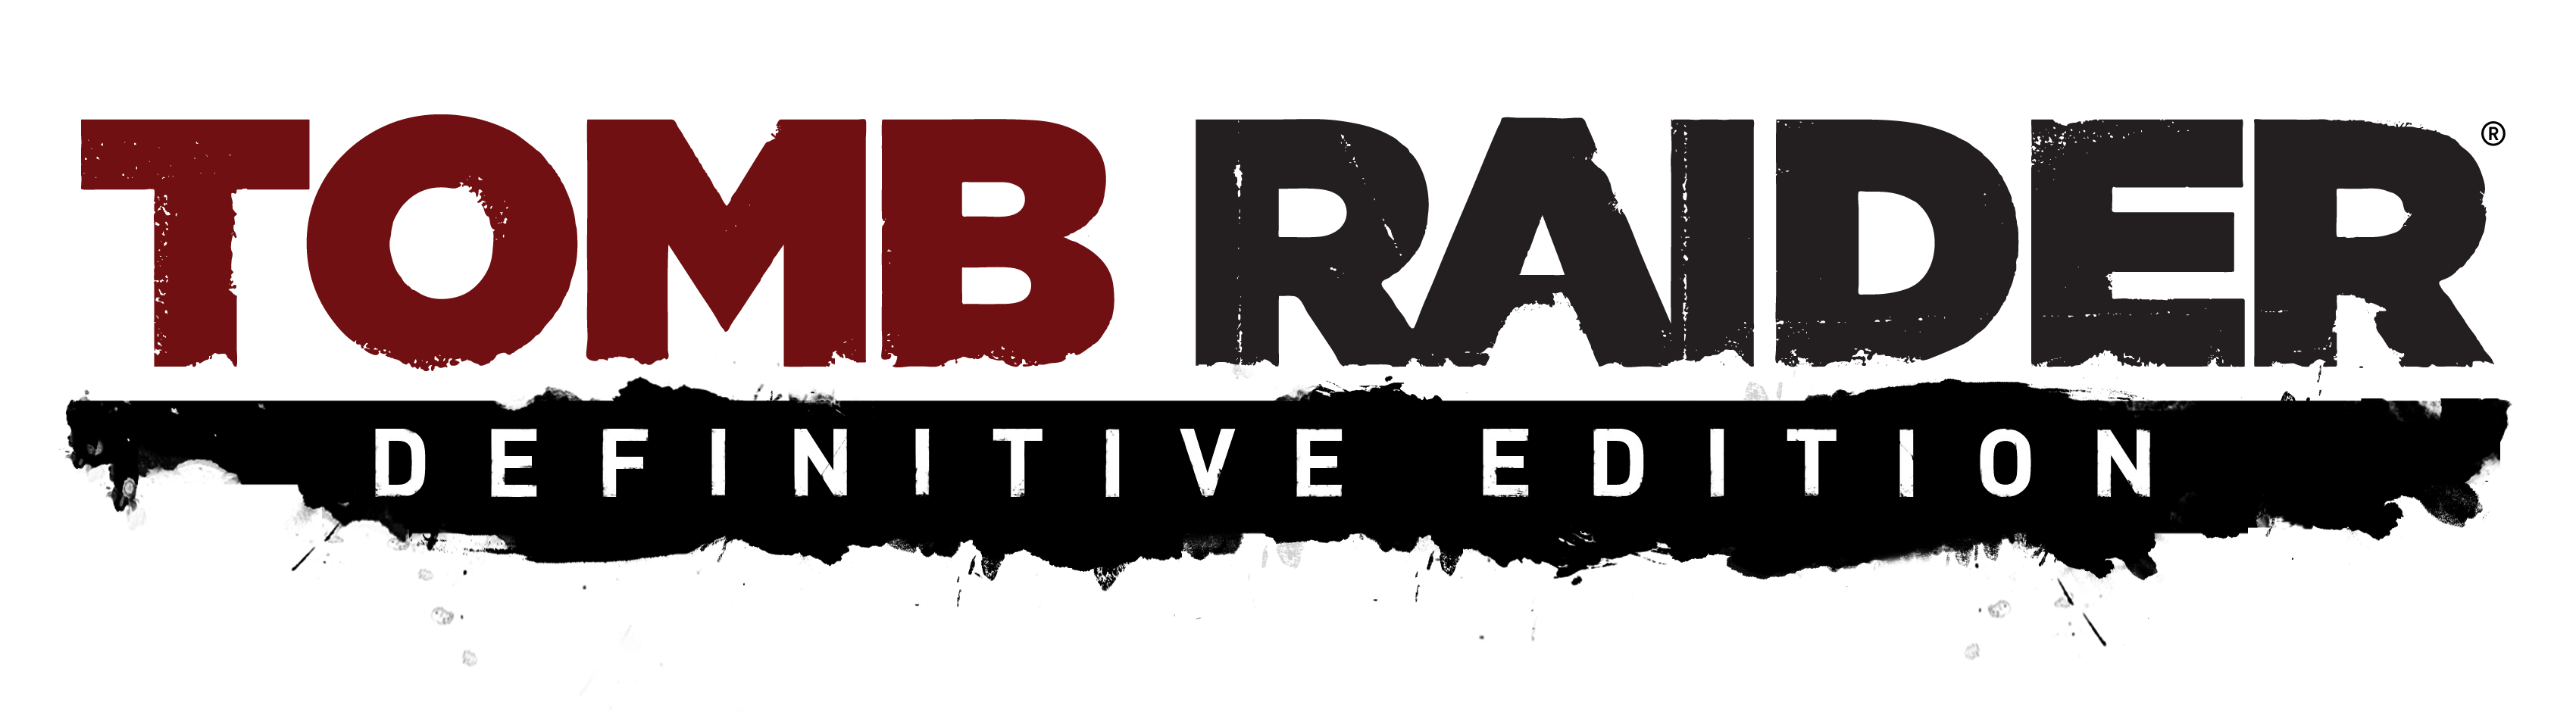 Tomb Raider Definitive Edition Logo